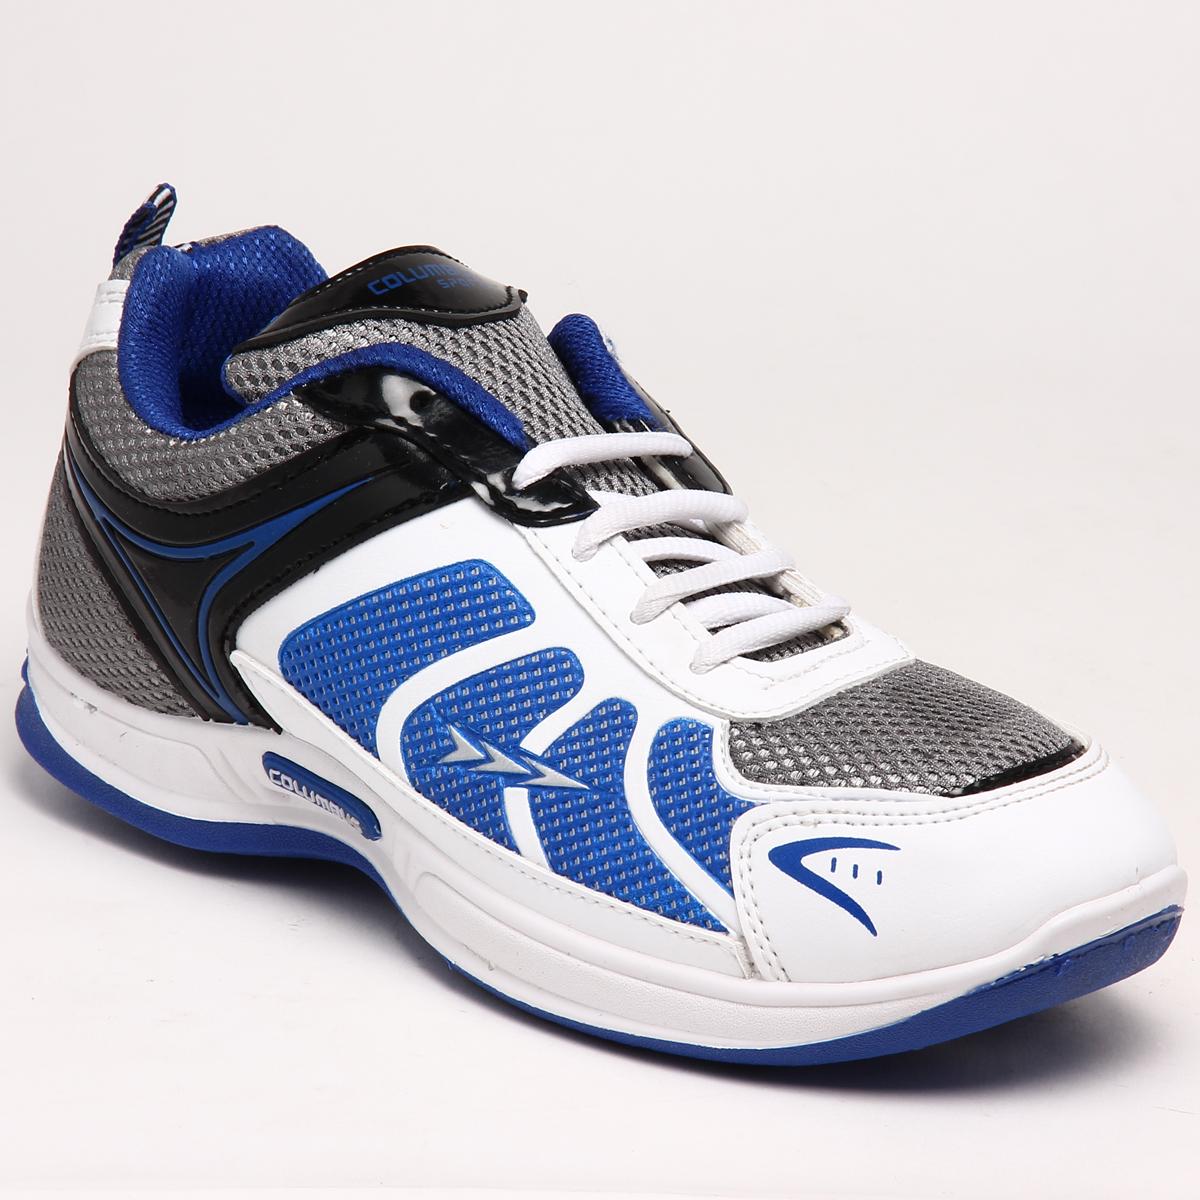 ... Men   Women Online in India ... reebok shoes price in delhi 2014 ...  Reebok Pulse Run Black Running Shoes . 58bed61ed